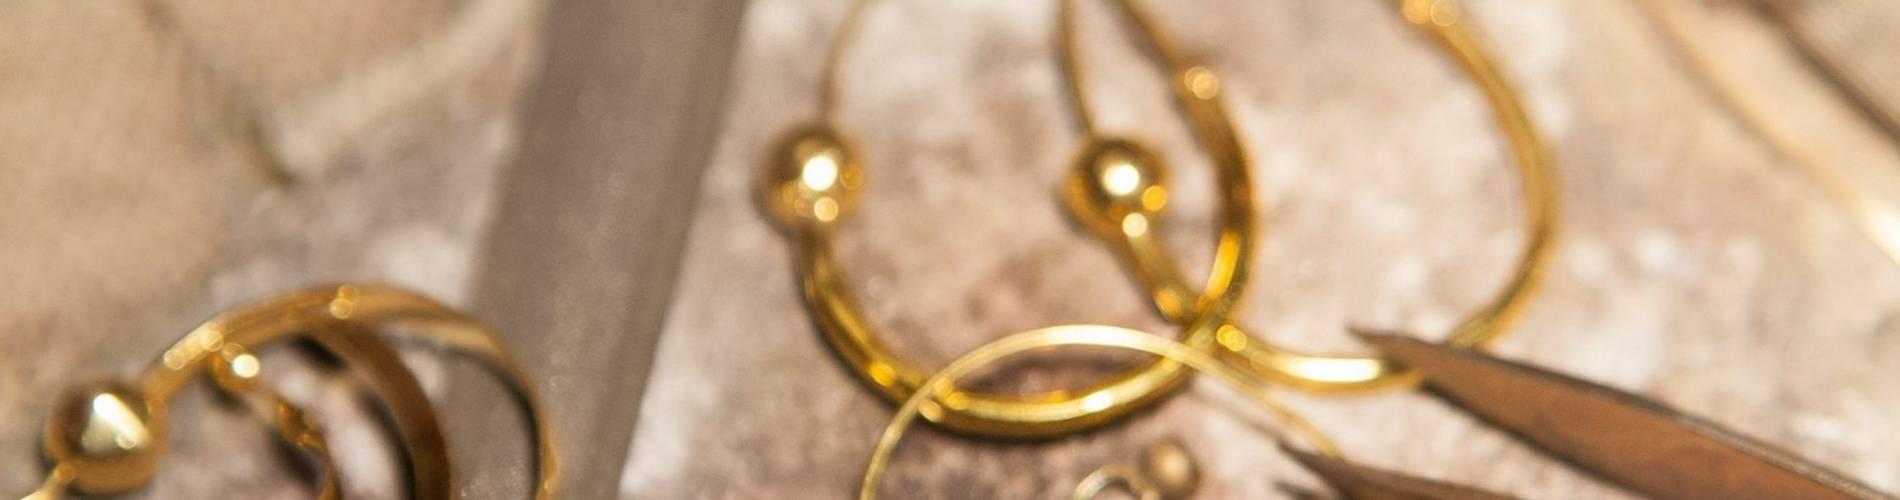 Handmade jewellery Hotel Villa Dubrovnik.jpg